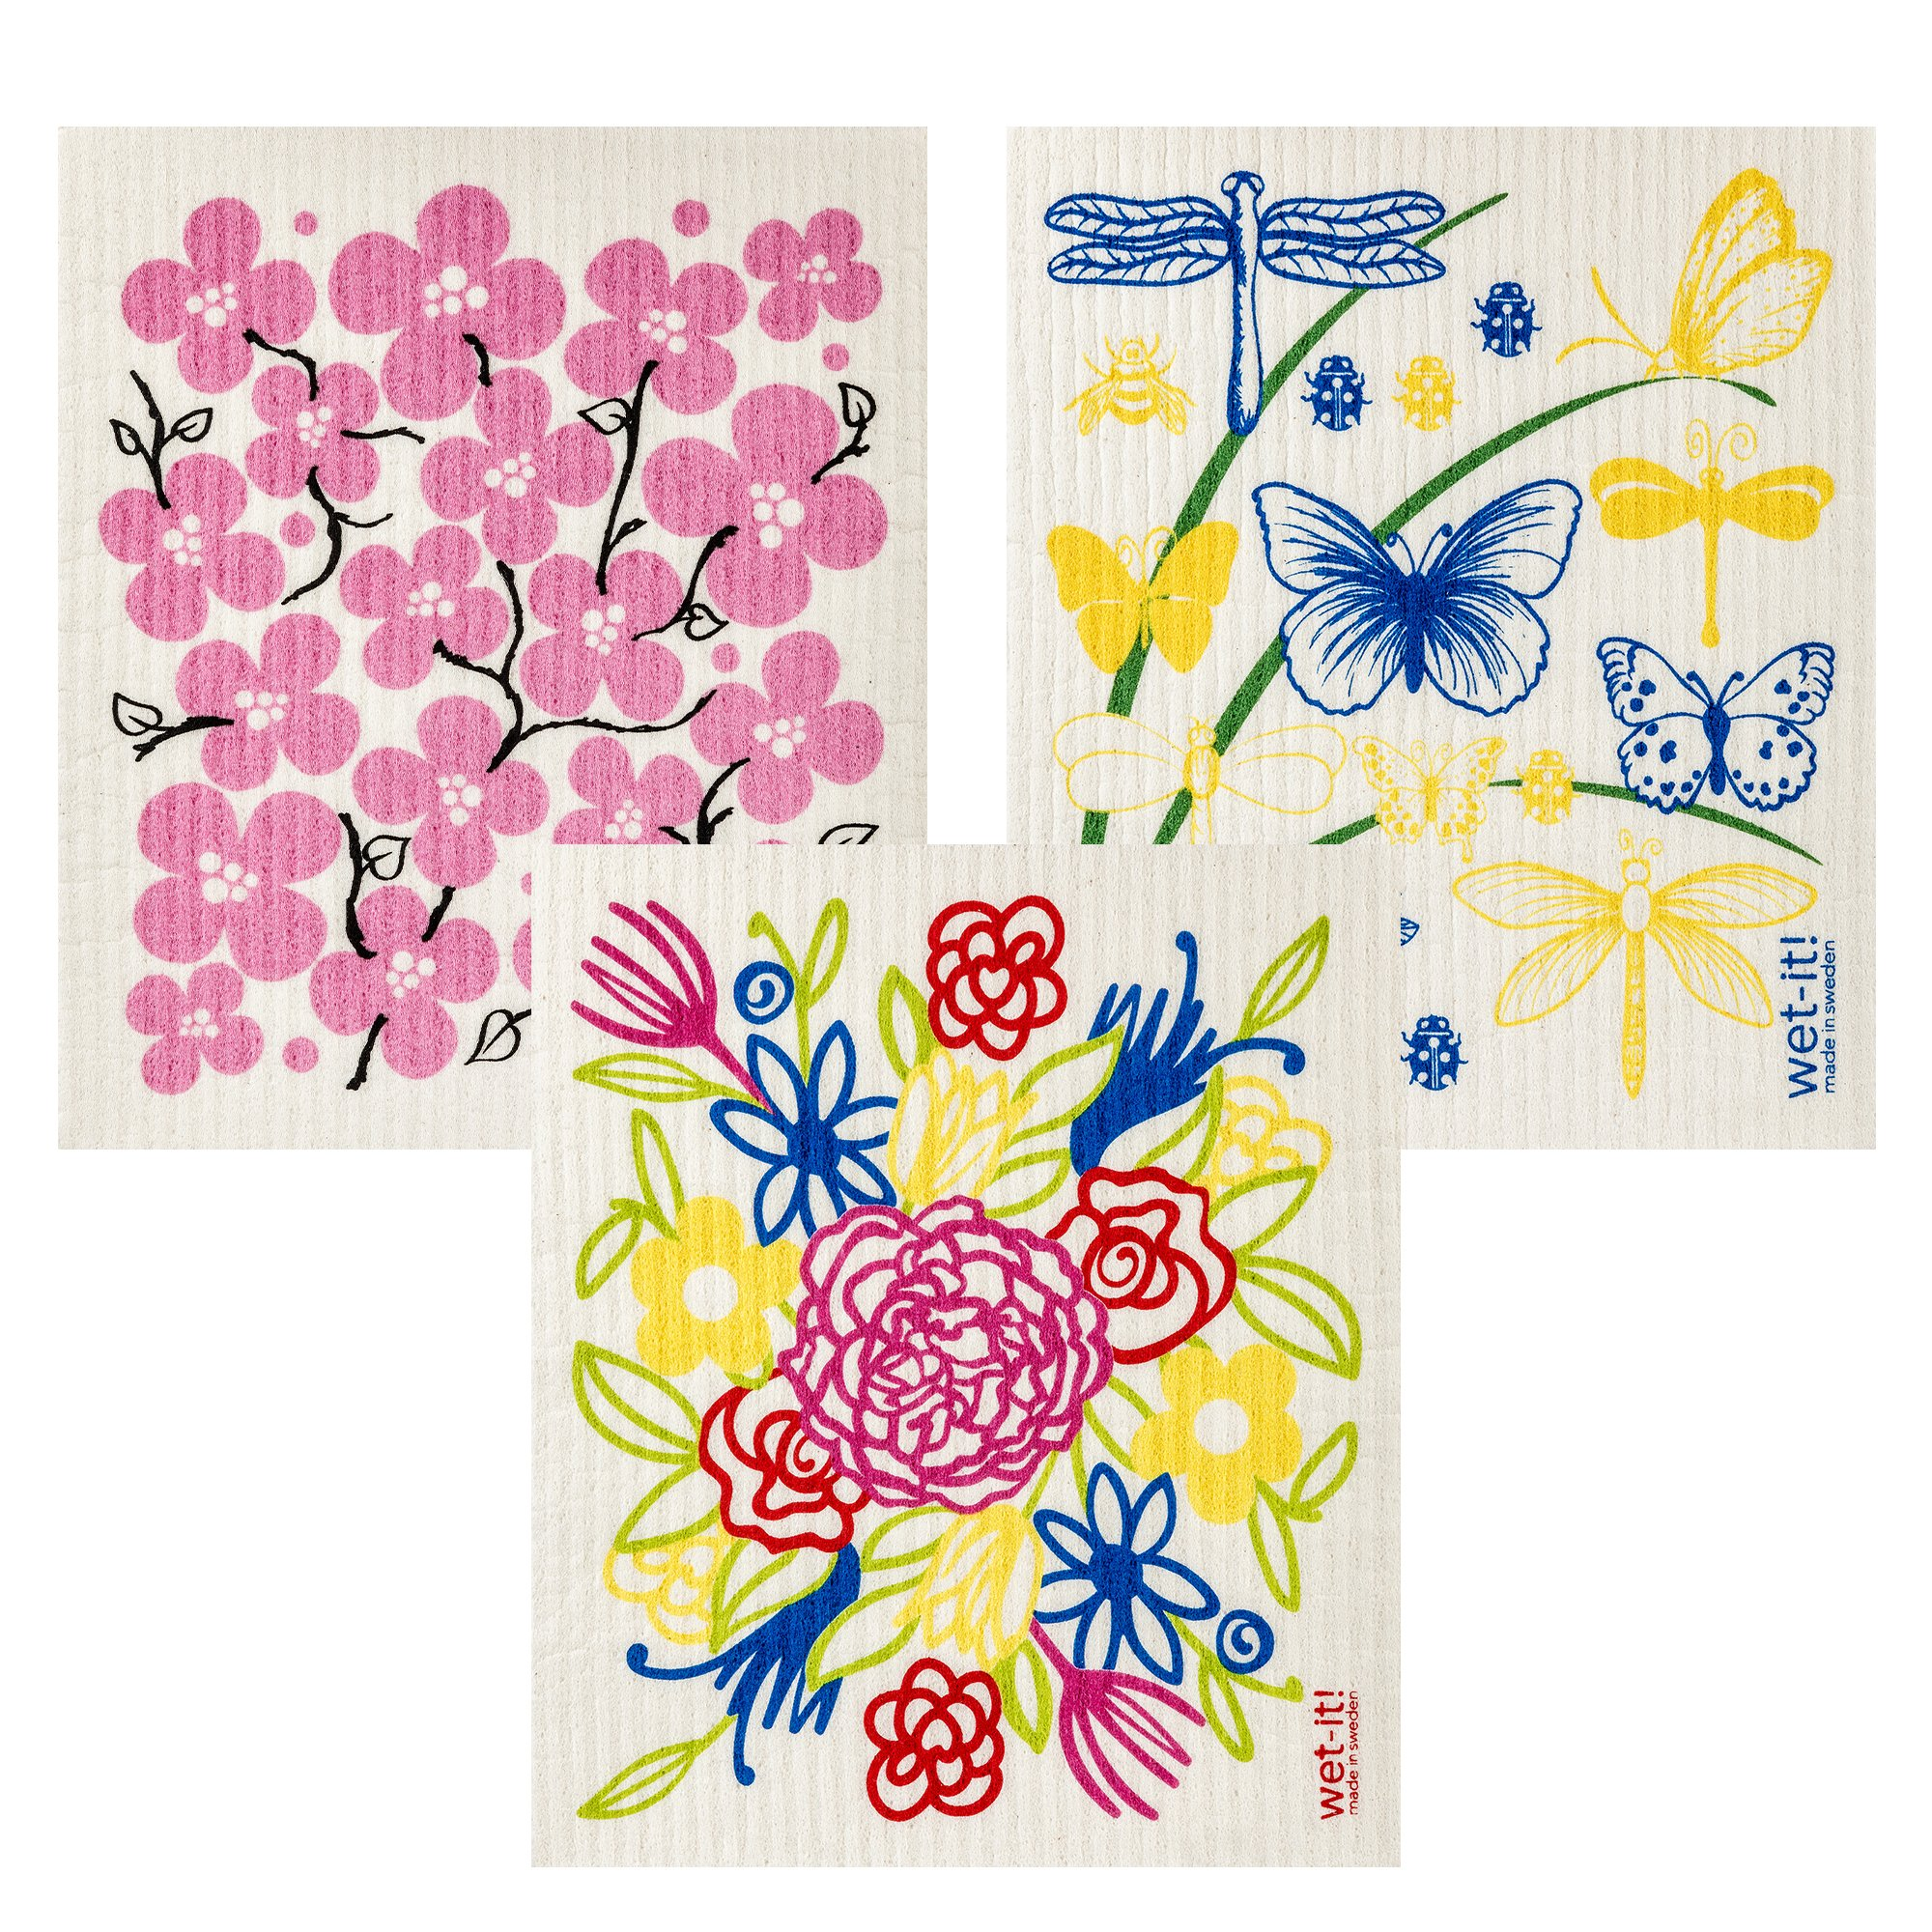 Wet-It Swedish Dishcloth Set of 3 (Flower Bouquet, Flower Patch and Butterflies)